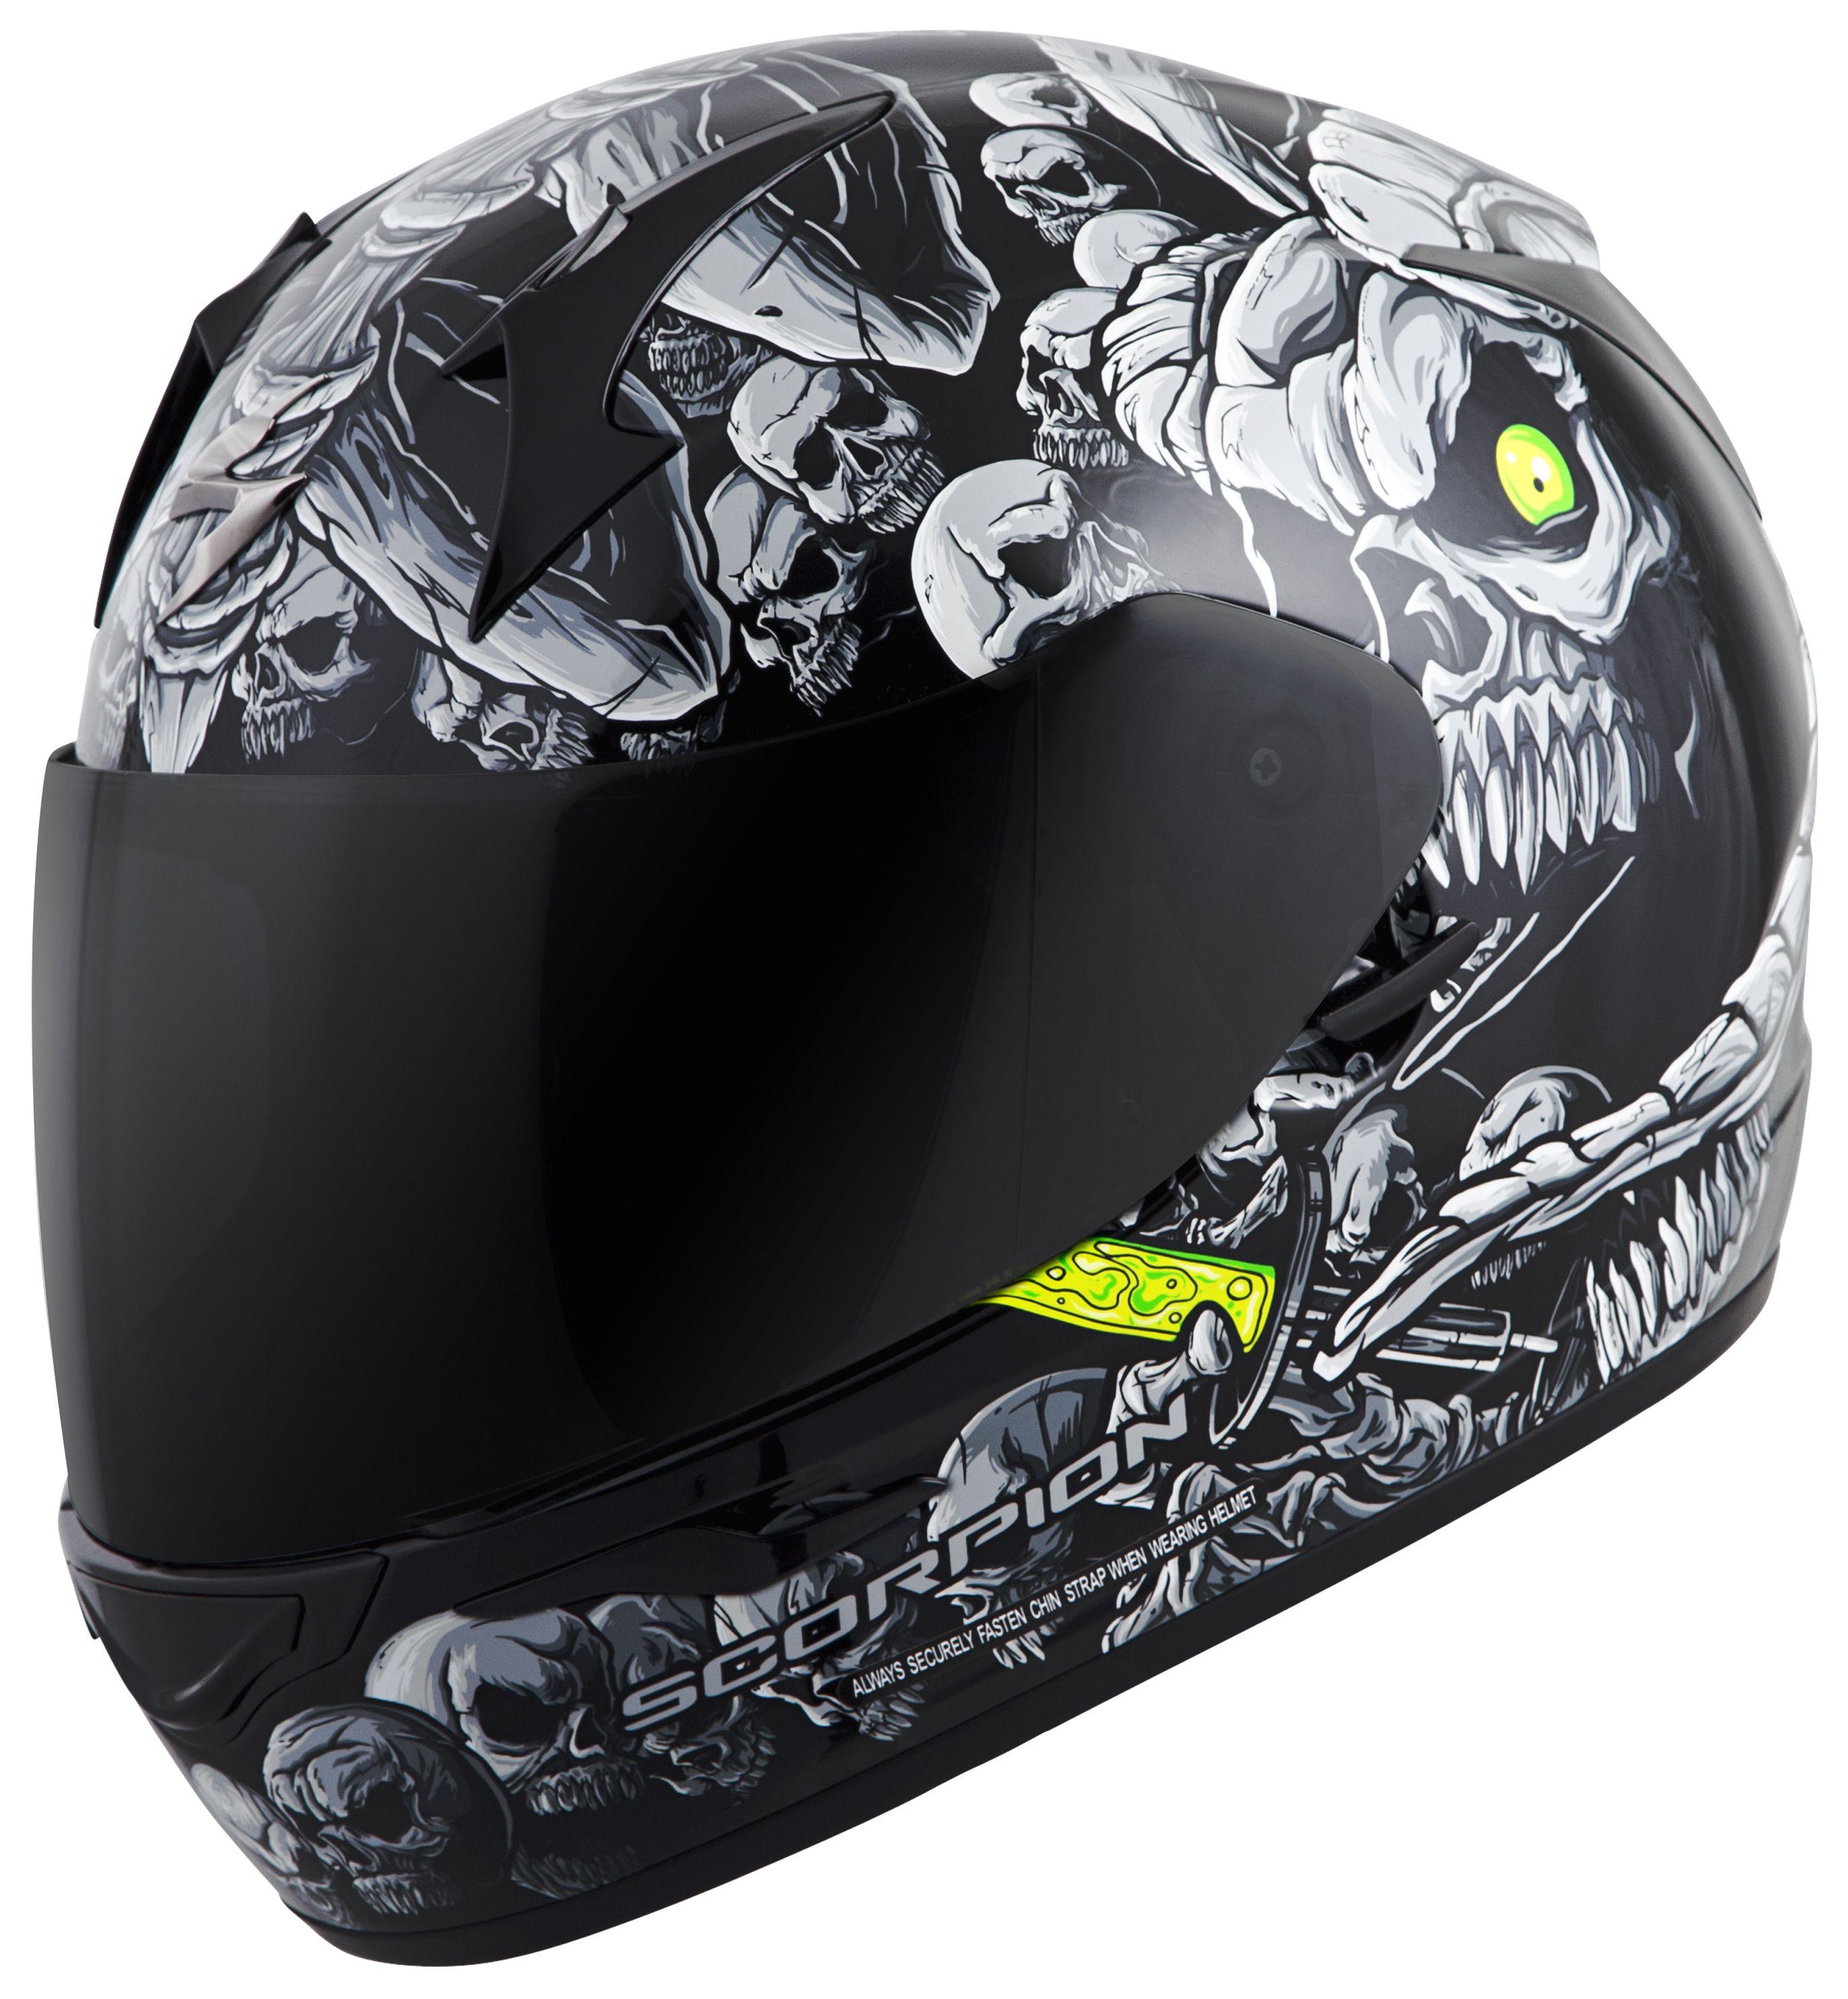 Scorpion Exo R410 Dr Sin Motorcycle Helmet 90 Dot Snell